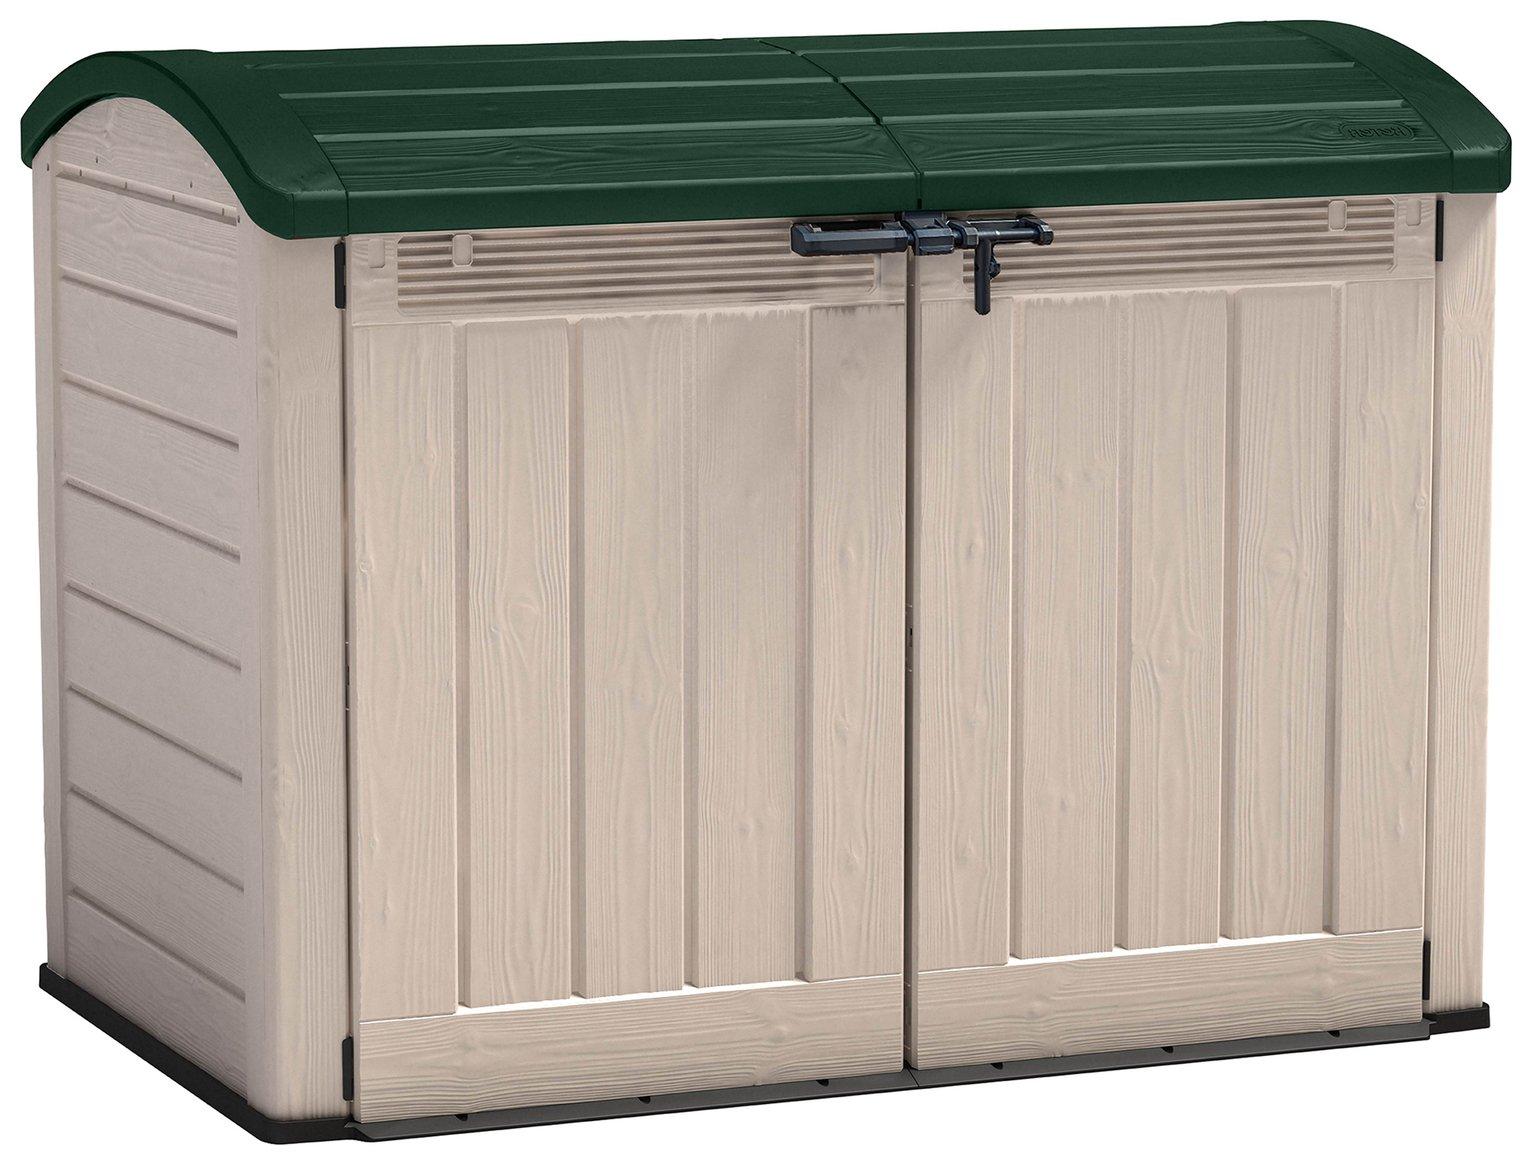 keter store it out ultra garden storage box. Black Bedroom Furniture Sets. Home Design Ideas